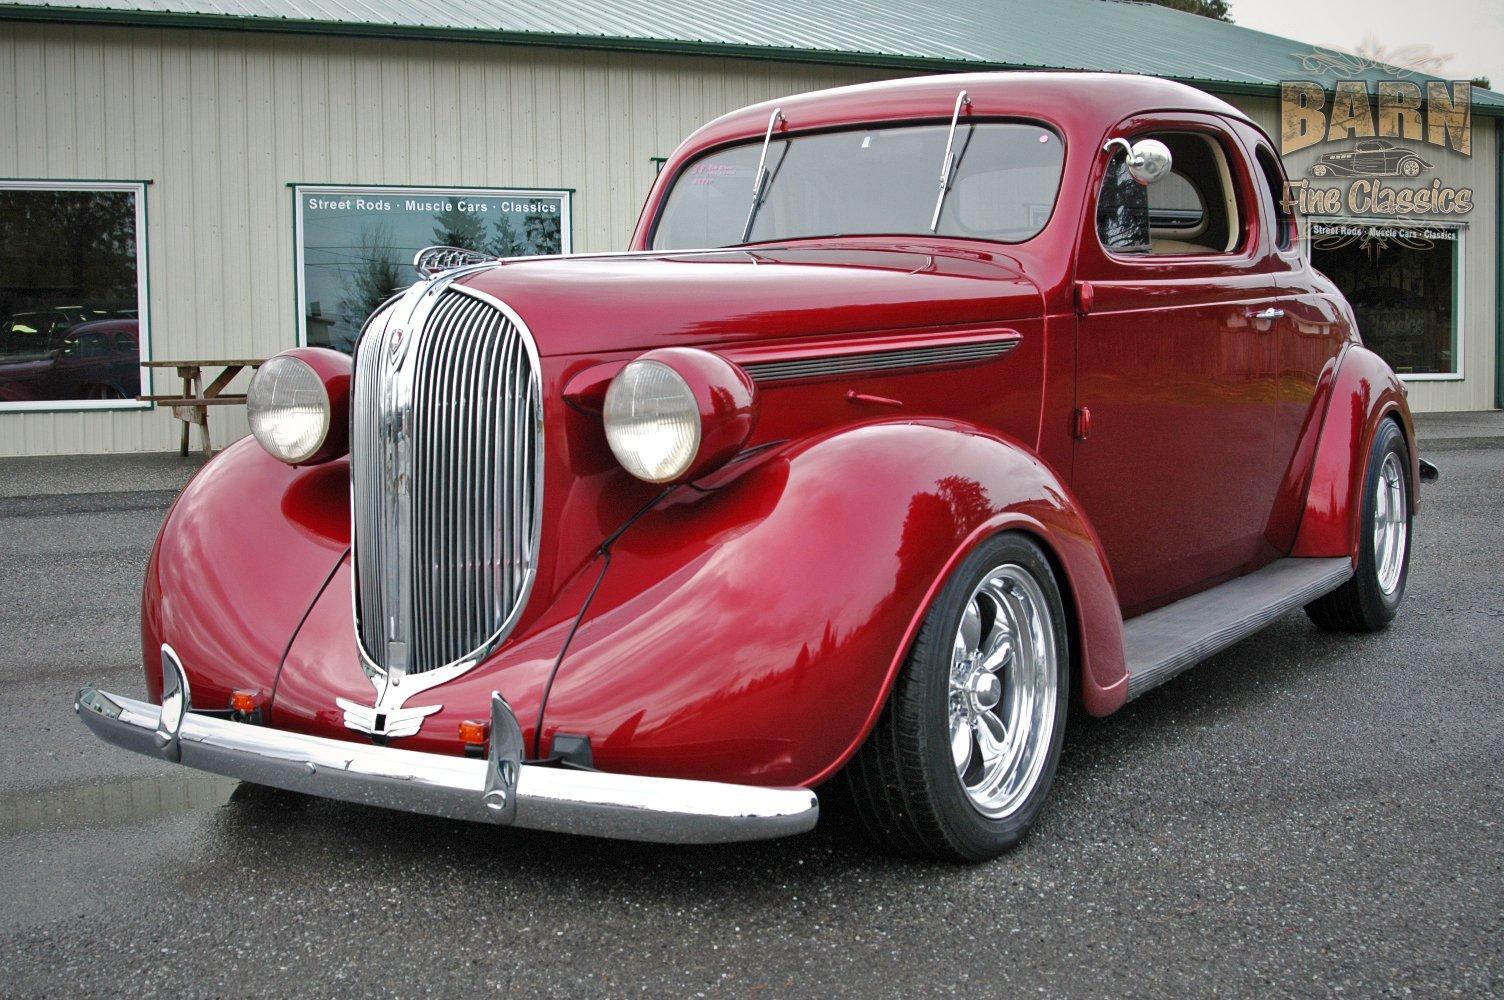 37 Plymouth Sedan1938 Coupe 2 Door Hotrod Streetrod Hot 1941 Deluxe 1938 Rod Street